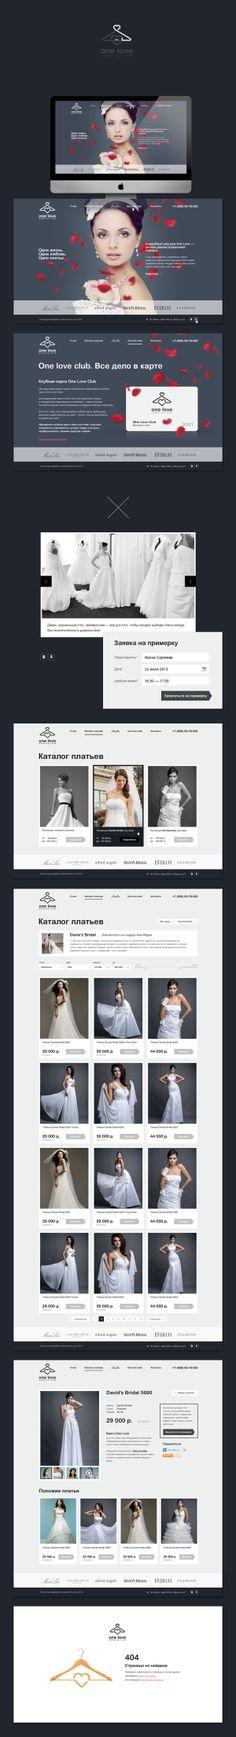 OneLove Wedding studio by Alexander Finogentov, via Behance